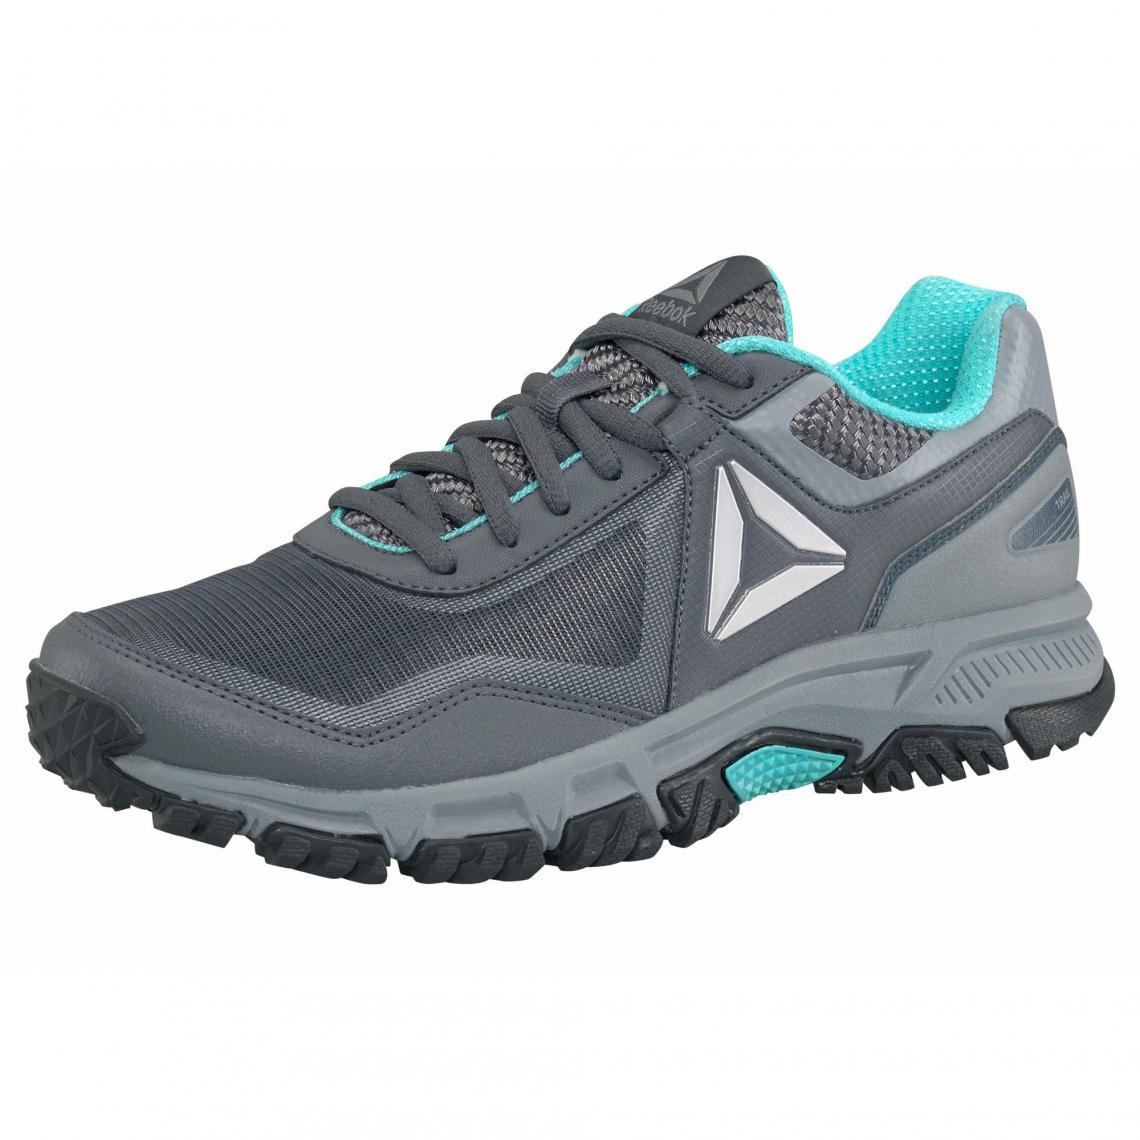 best sneakers cdc9e 5b779 Reebok Ridgerider Trail 3.0 chaussures de trainning femme - Gris -  Turquoise Reebok Femme